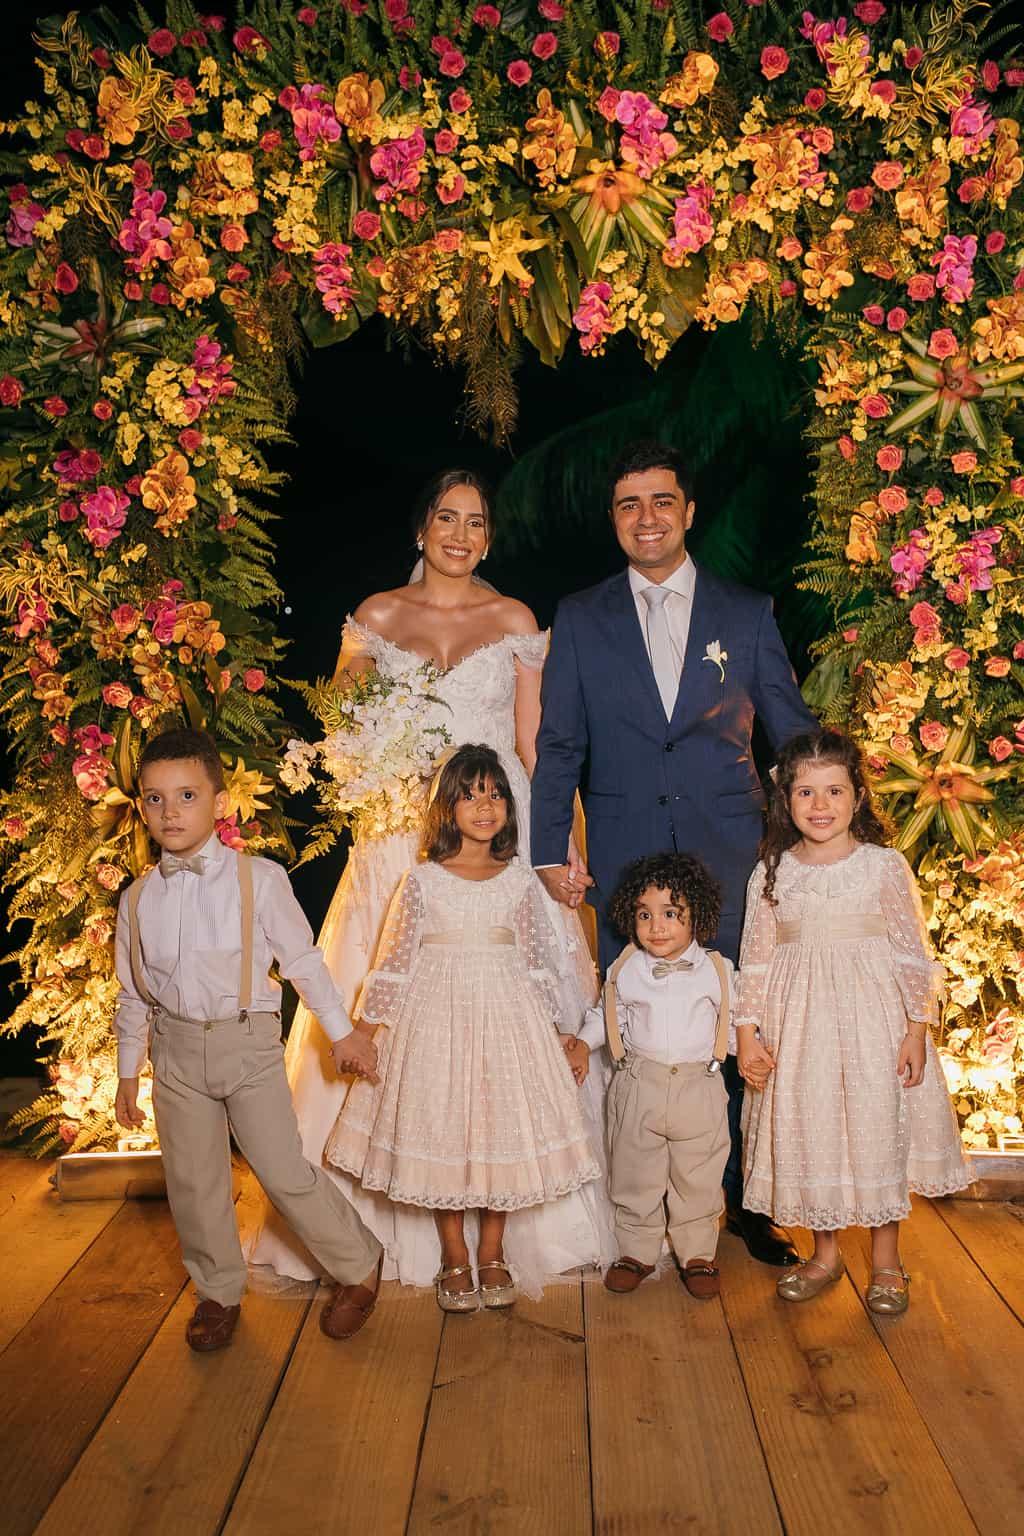 Casamento-Gardenia-e-Marcos-Antonio-Paulo-Bezerra-Joao-Curvelo-Carol-Maiorano0986